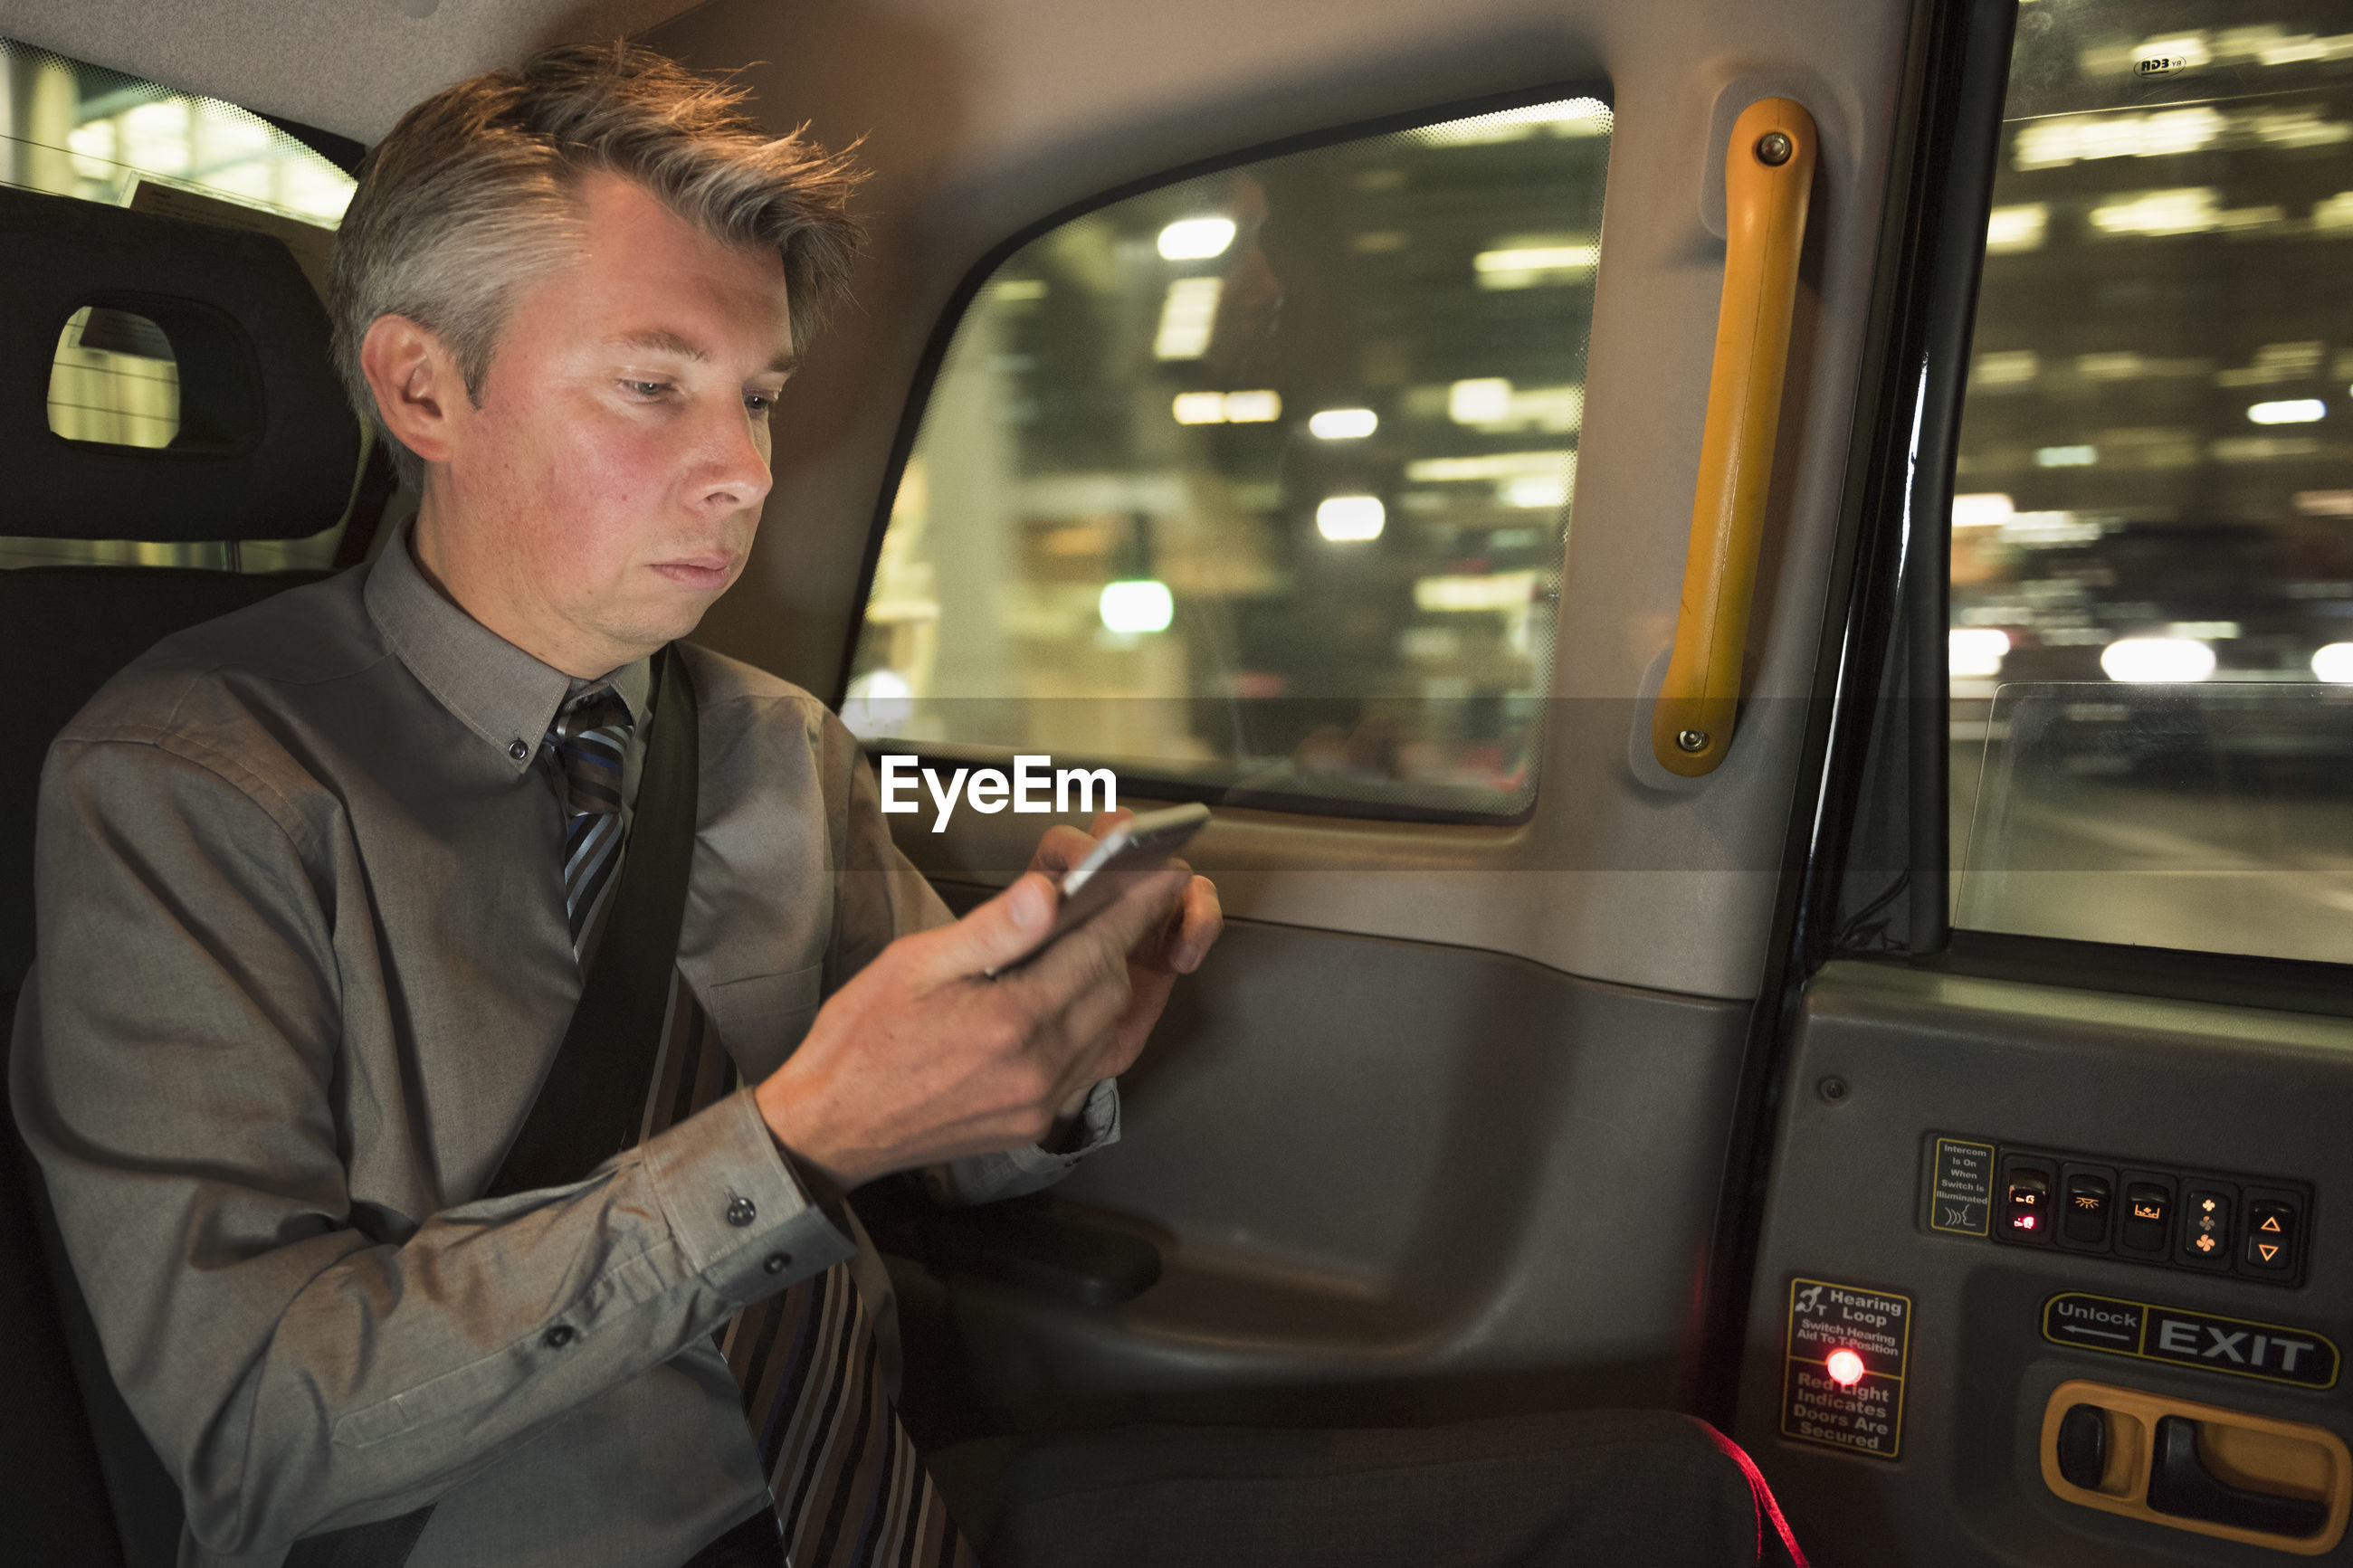 Man using phone while sitting in car